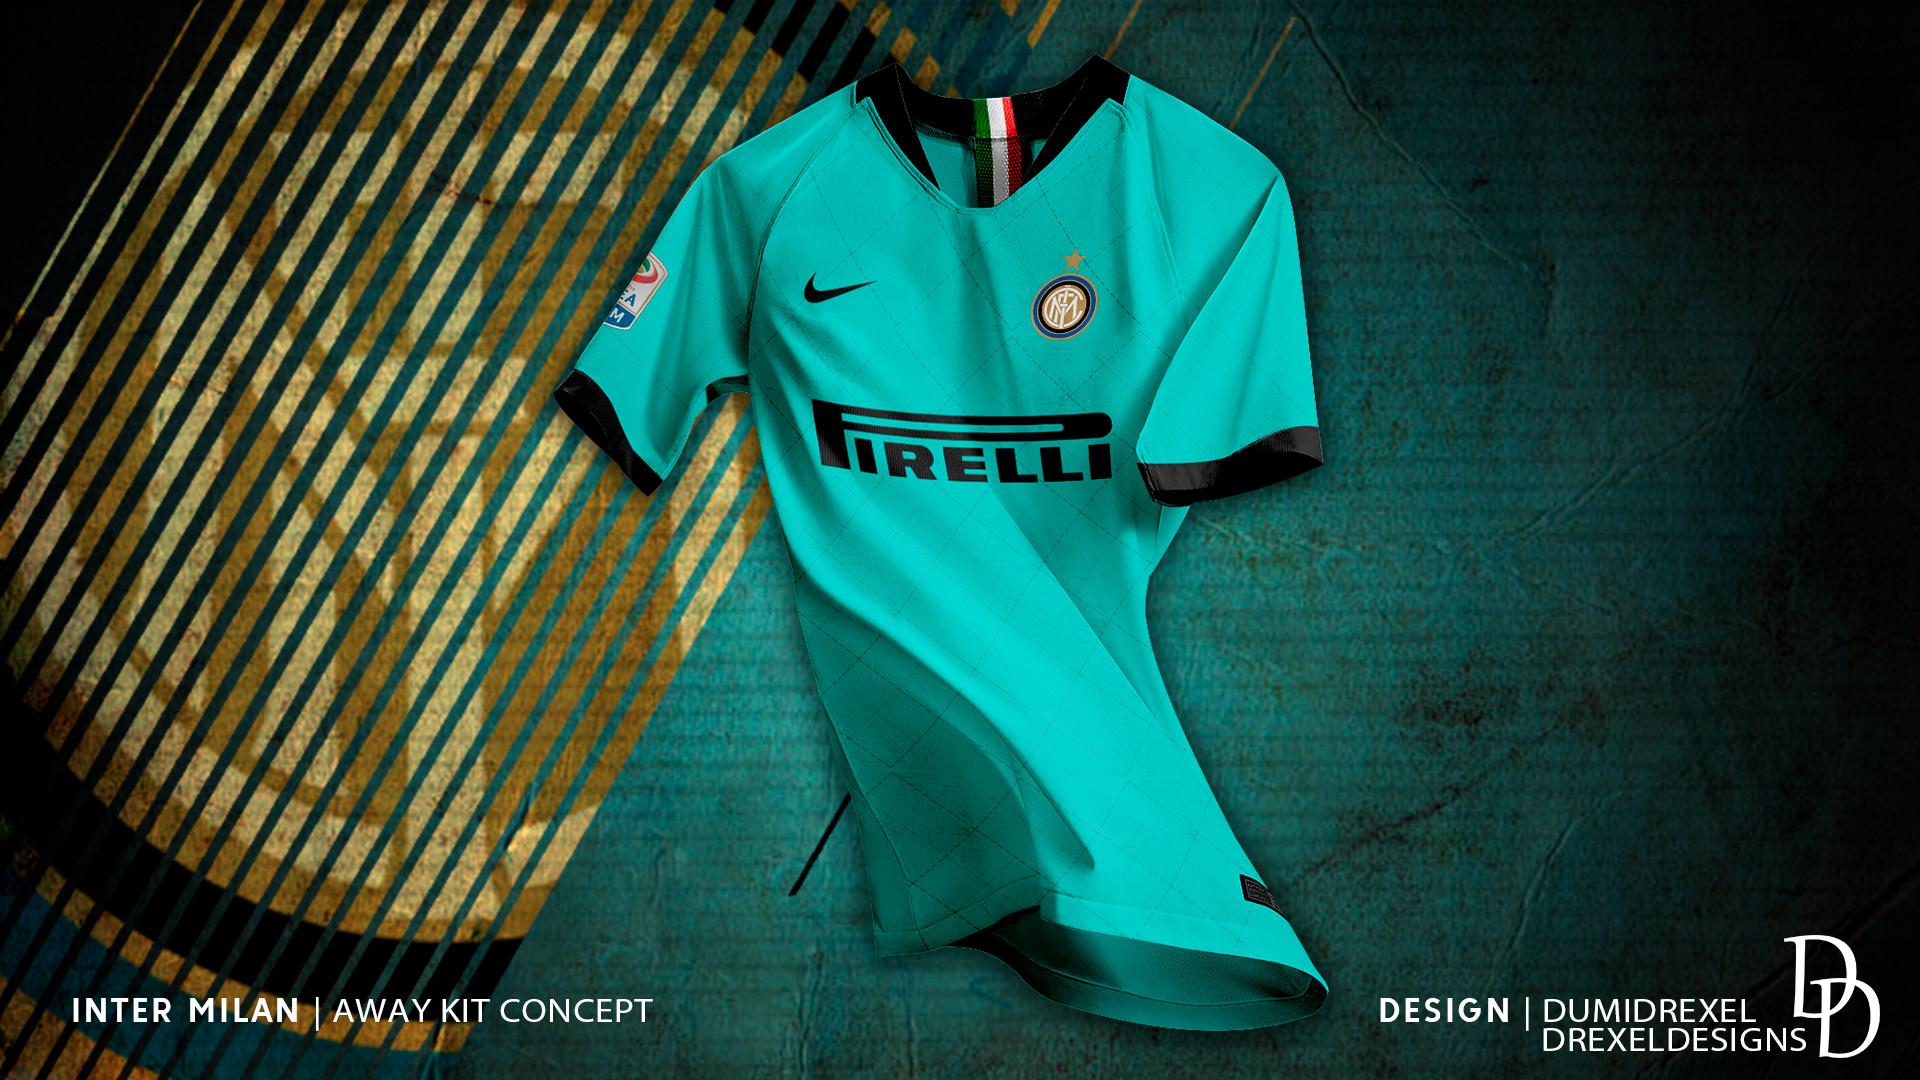 cheaper 940a8 ee79f ArtStation - Inter Milan - Away Kit 19/20 Concept, Drexel ...